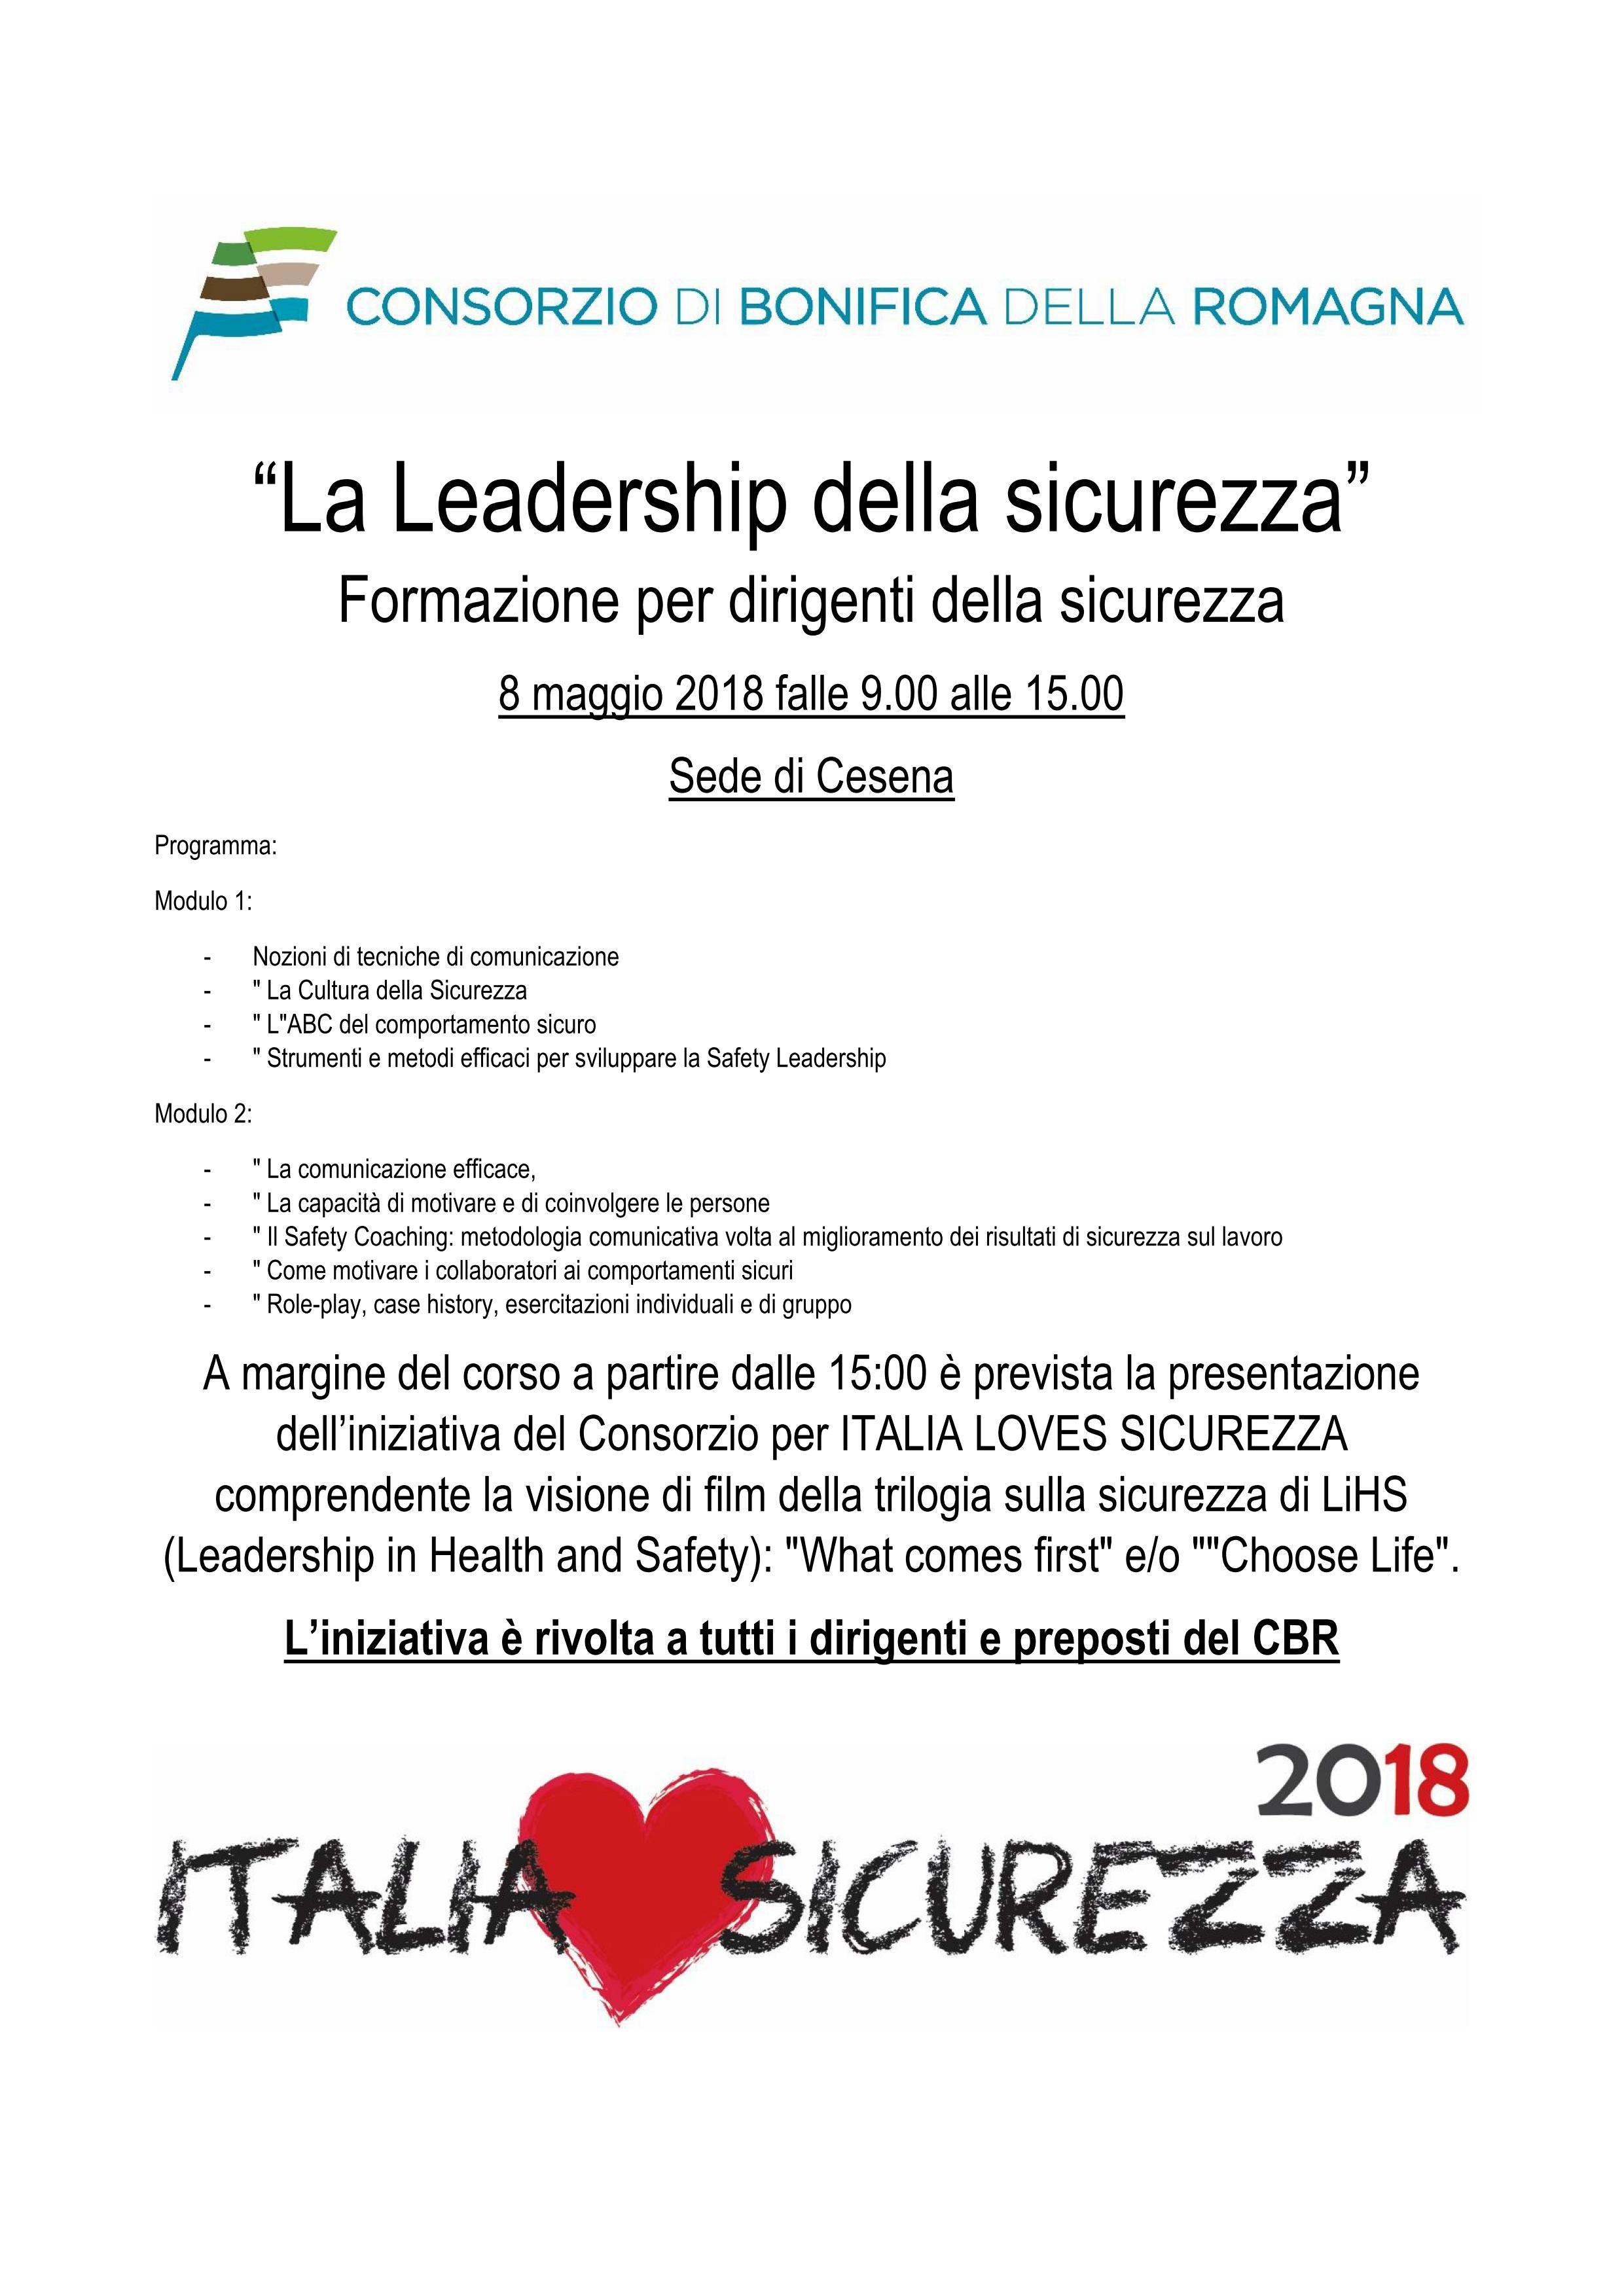 http://www.fondlhs.org/wp-content/uploads/2018/04/La-Leadership-della-sicurezza_01.jpg